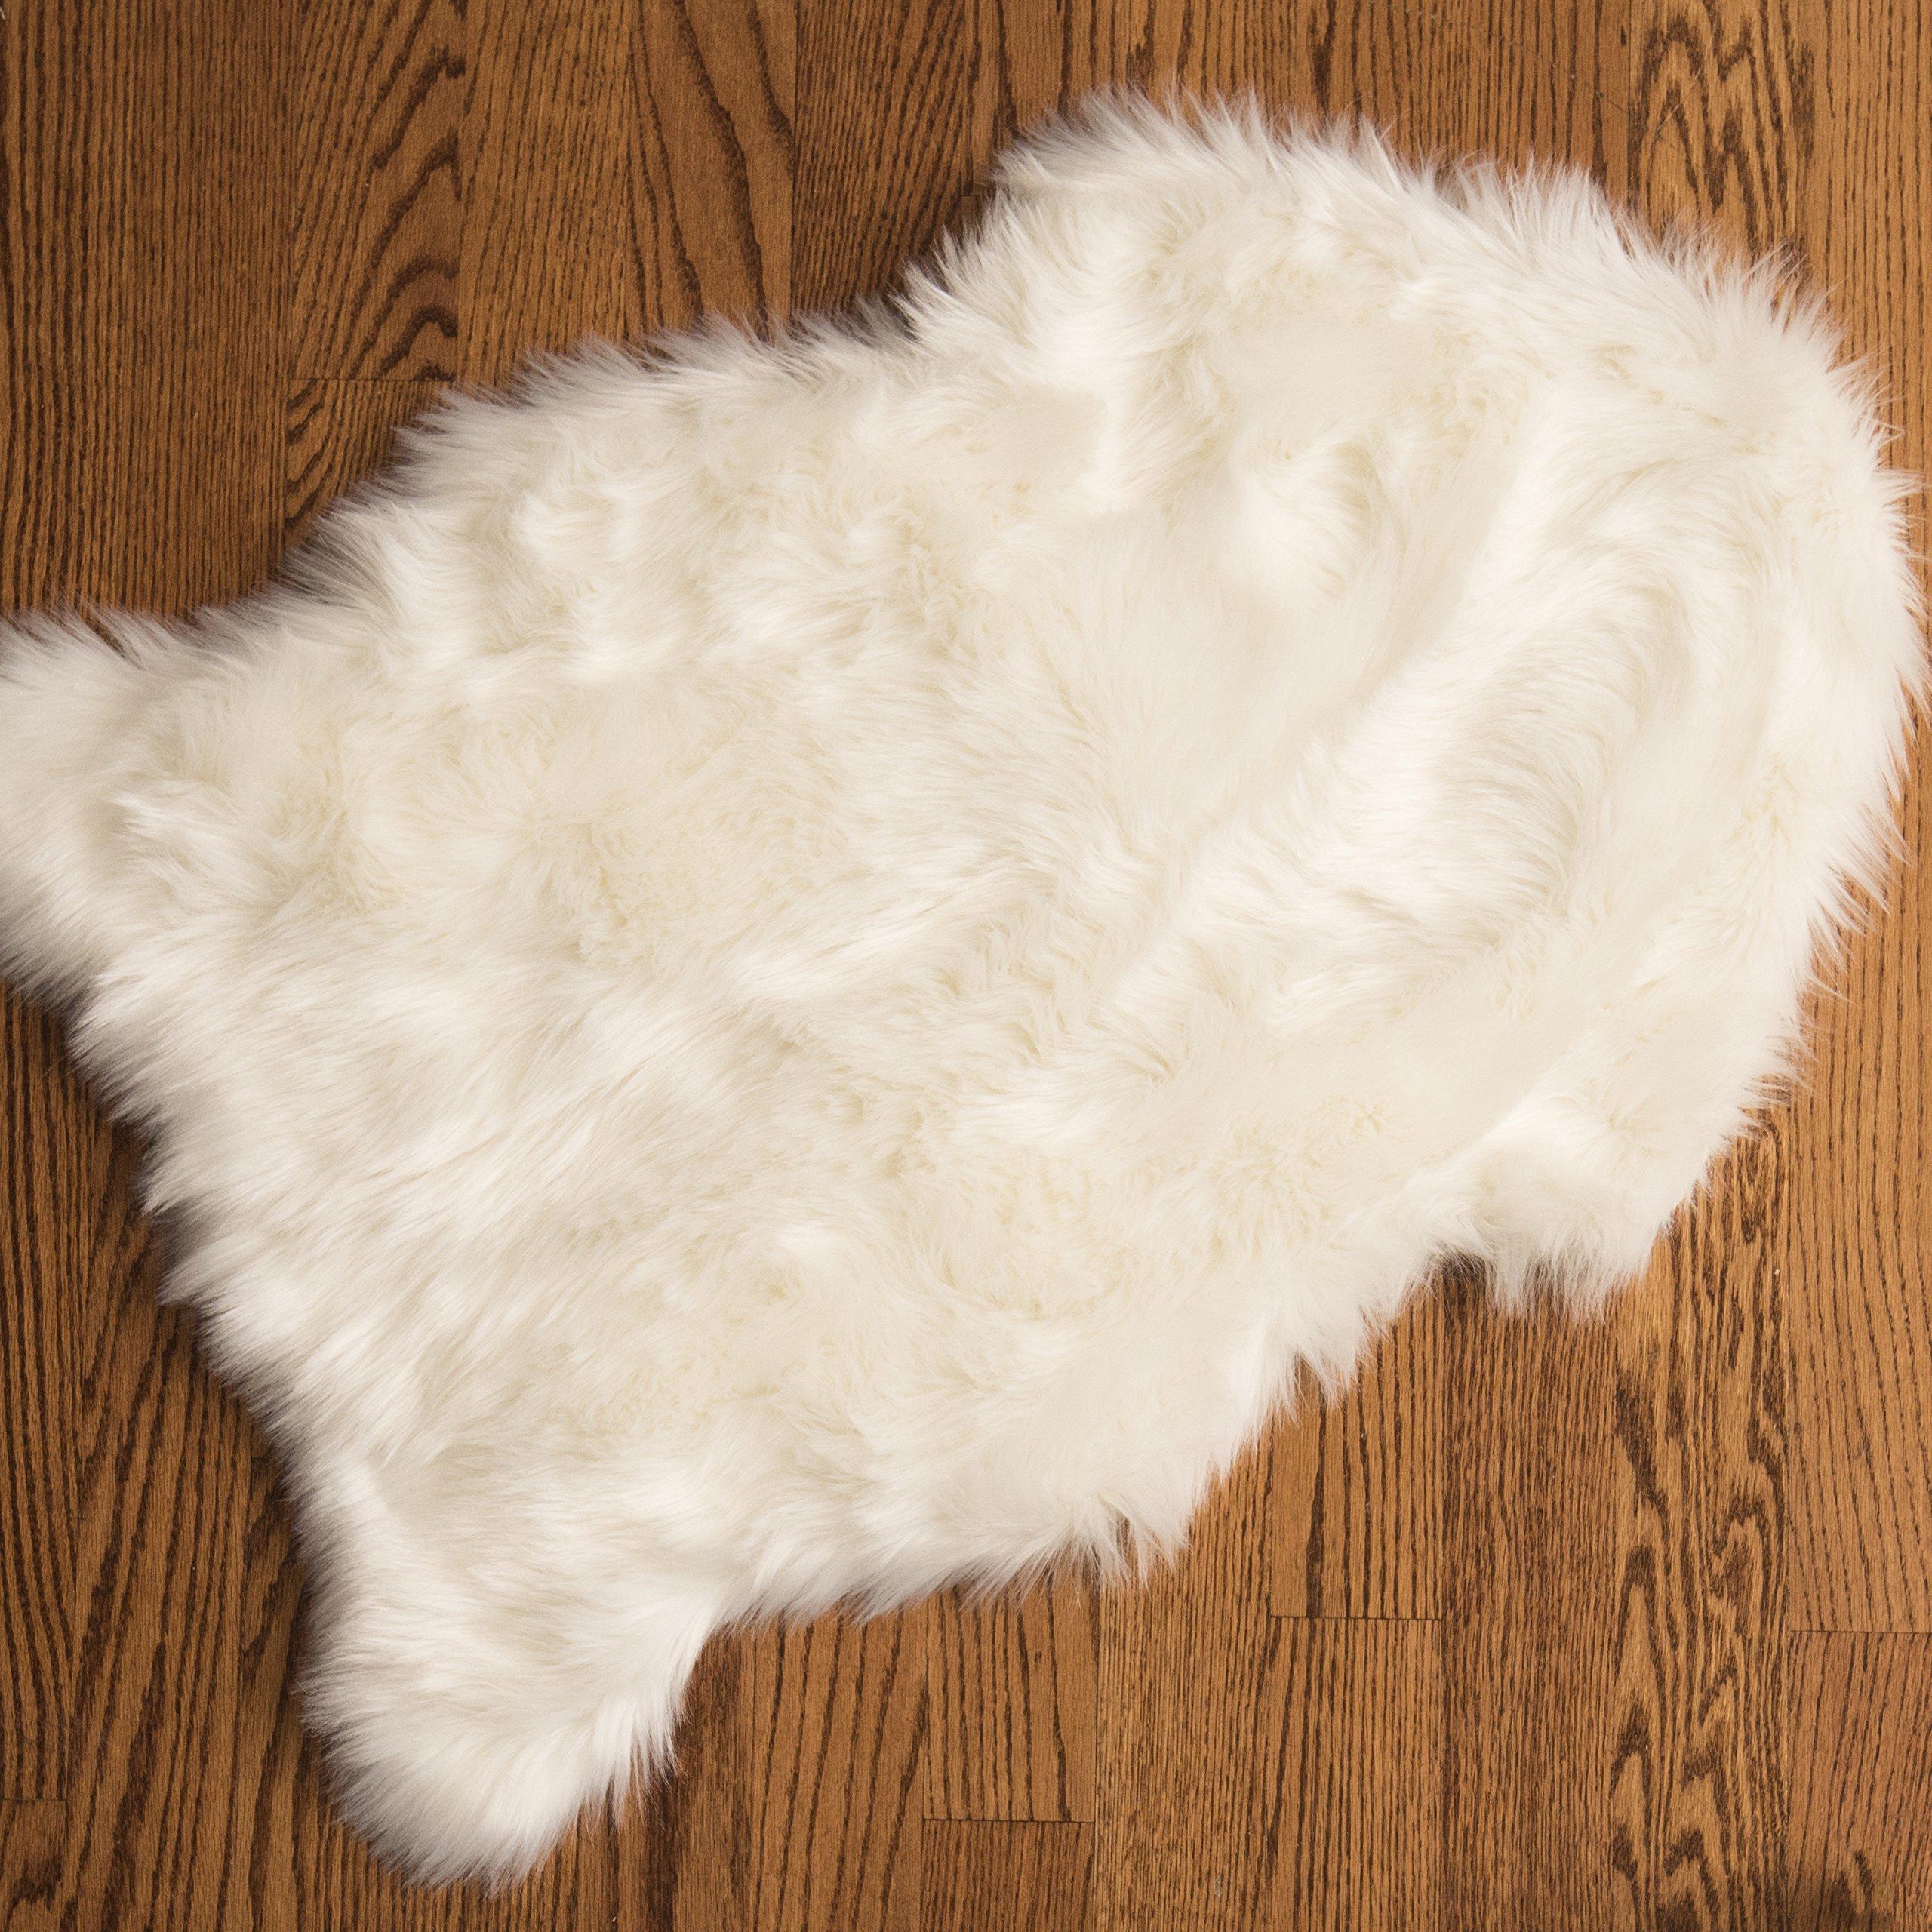 Genteele Luxurious Faux Fur Sheepskin Rug - Super Soft Plush White Faux Australian Fur Elegant Area Rug, 2 Feet X 3 Feet, White